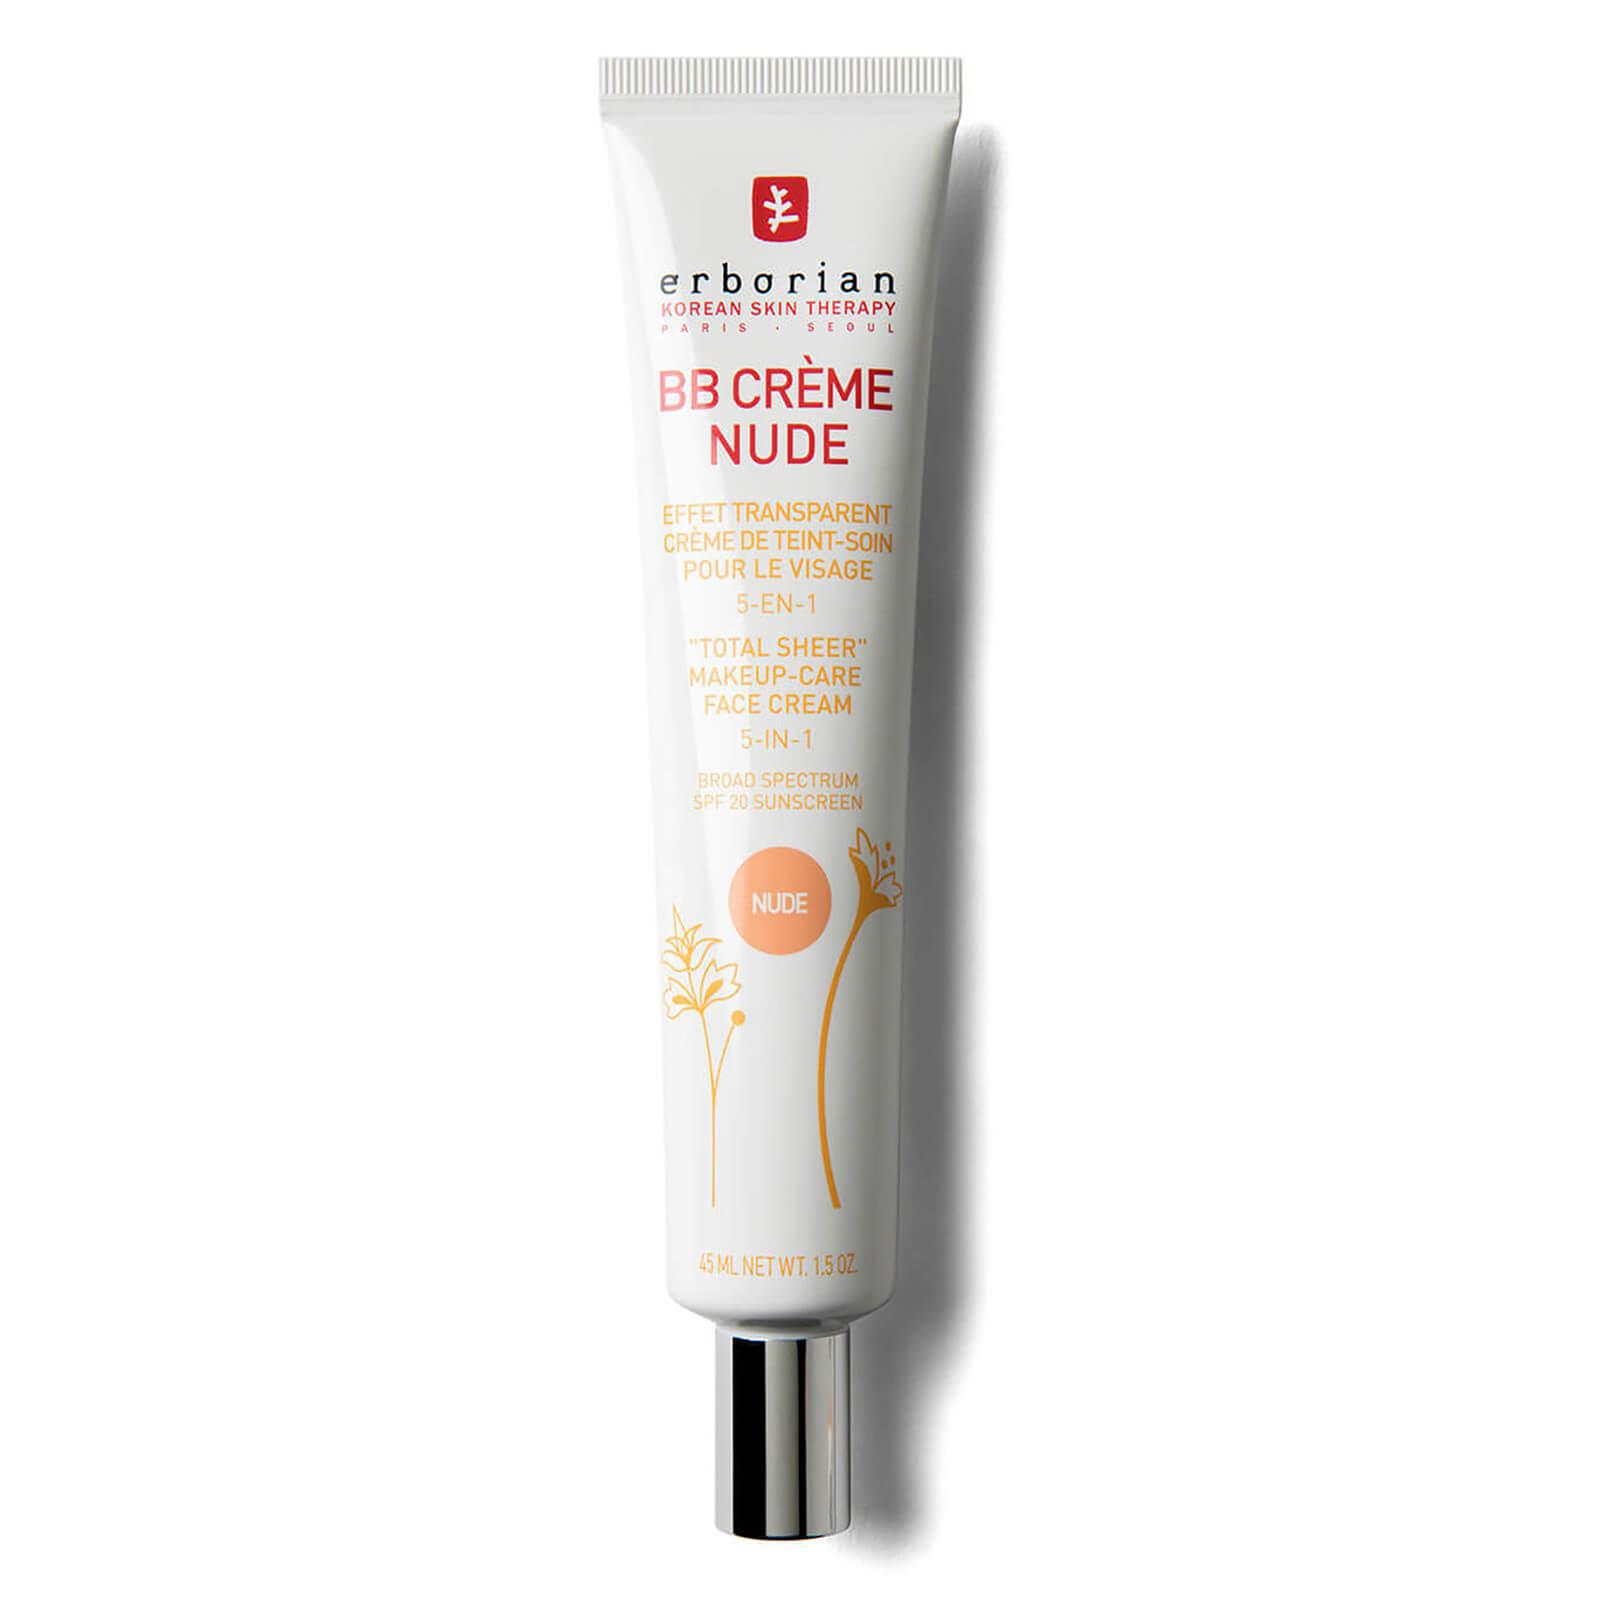 Erborian BB Cream 45ml (Various Shades) - Nude